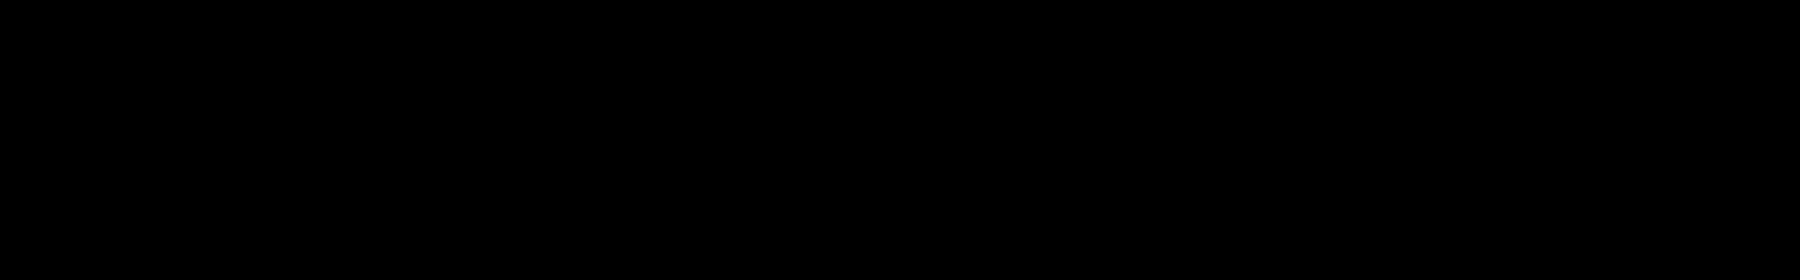 Neon Reggaeton audio waveform